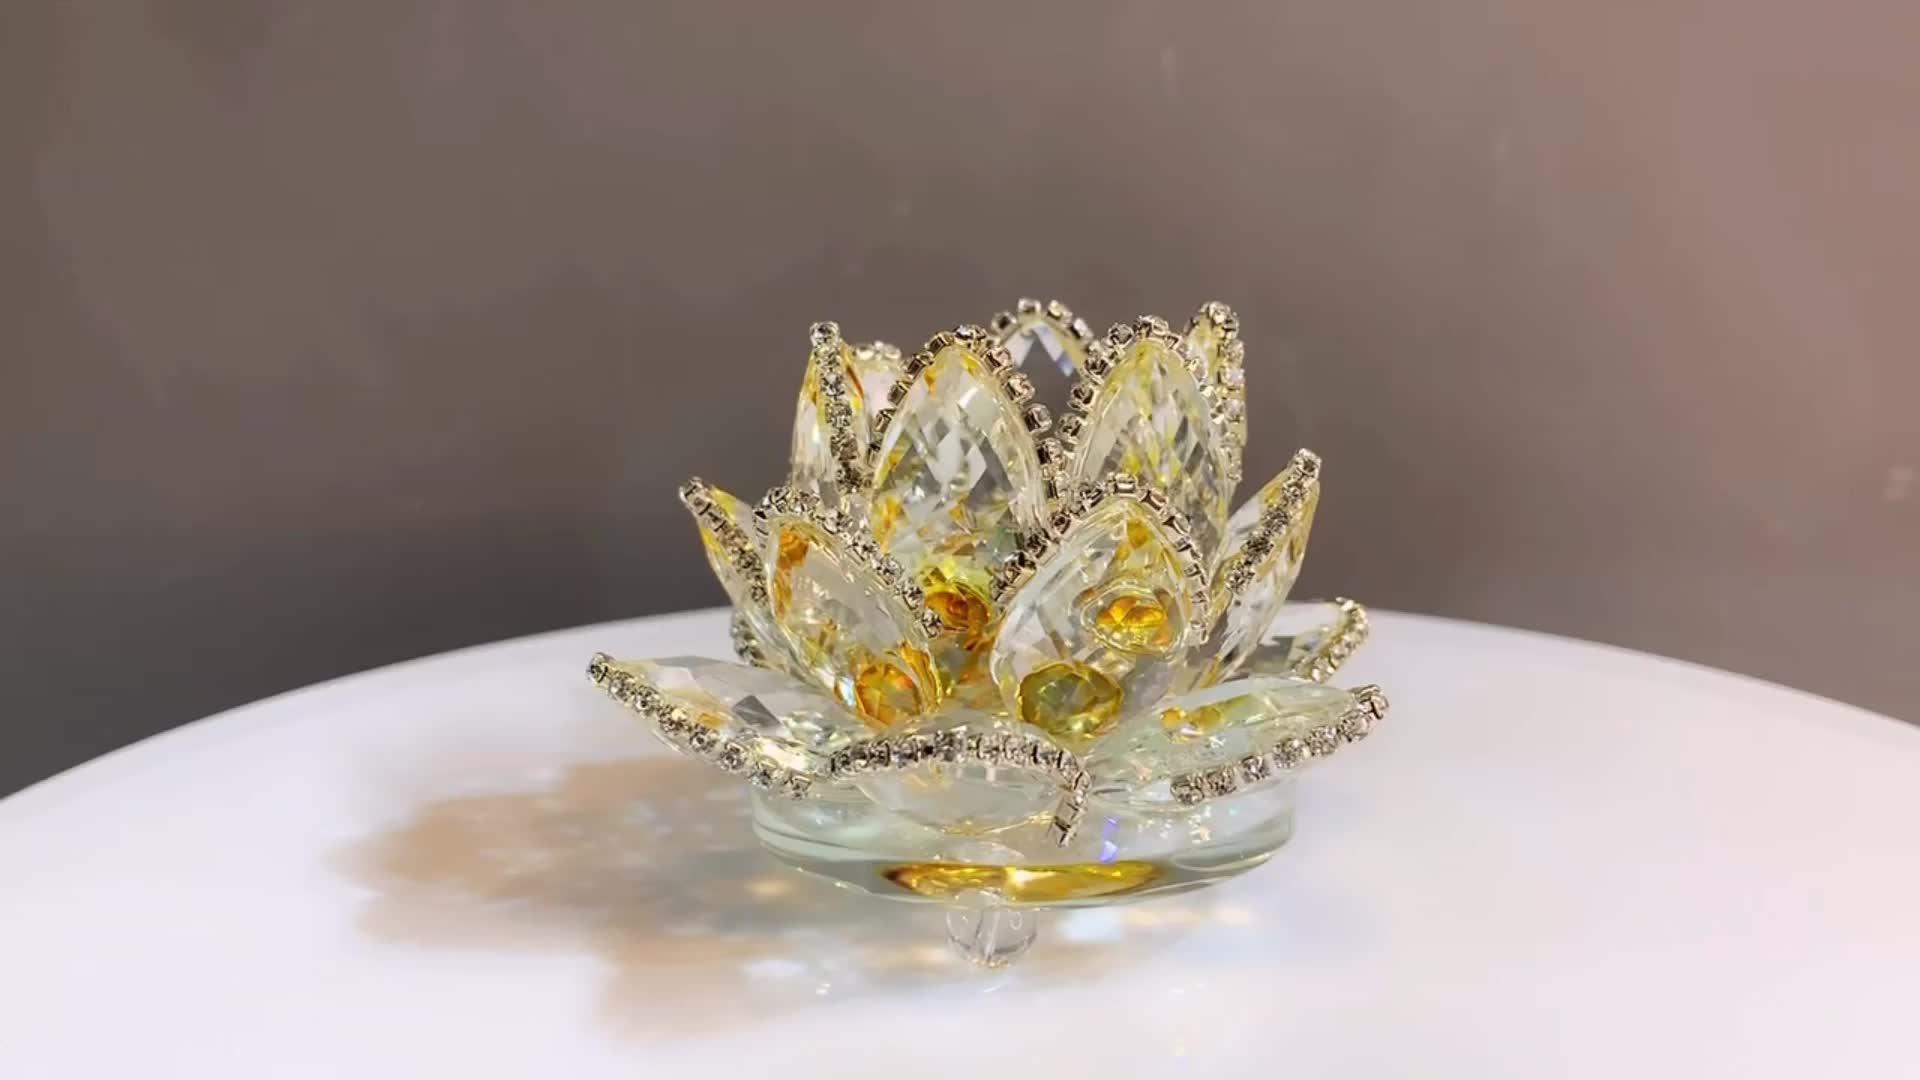 H & D ホリデーギフト工芸品クリスタル蓮の花の装飾品風水マスコットクリスタル花家の装飾アクセサリー妖精の庭